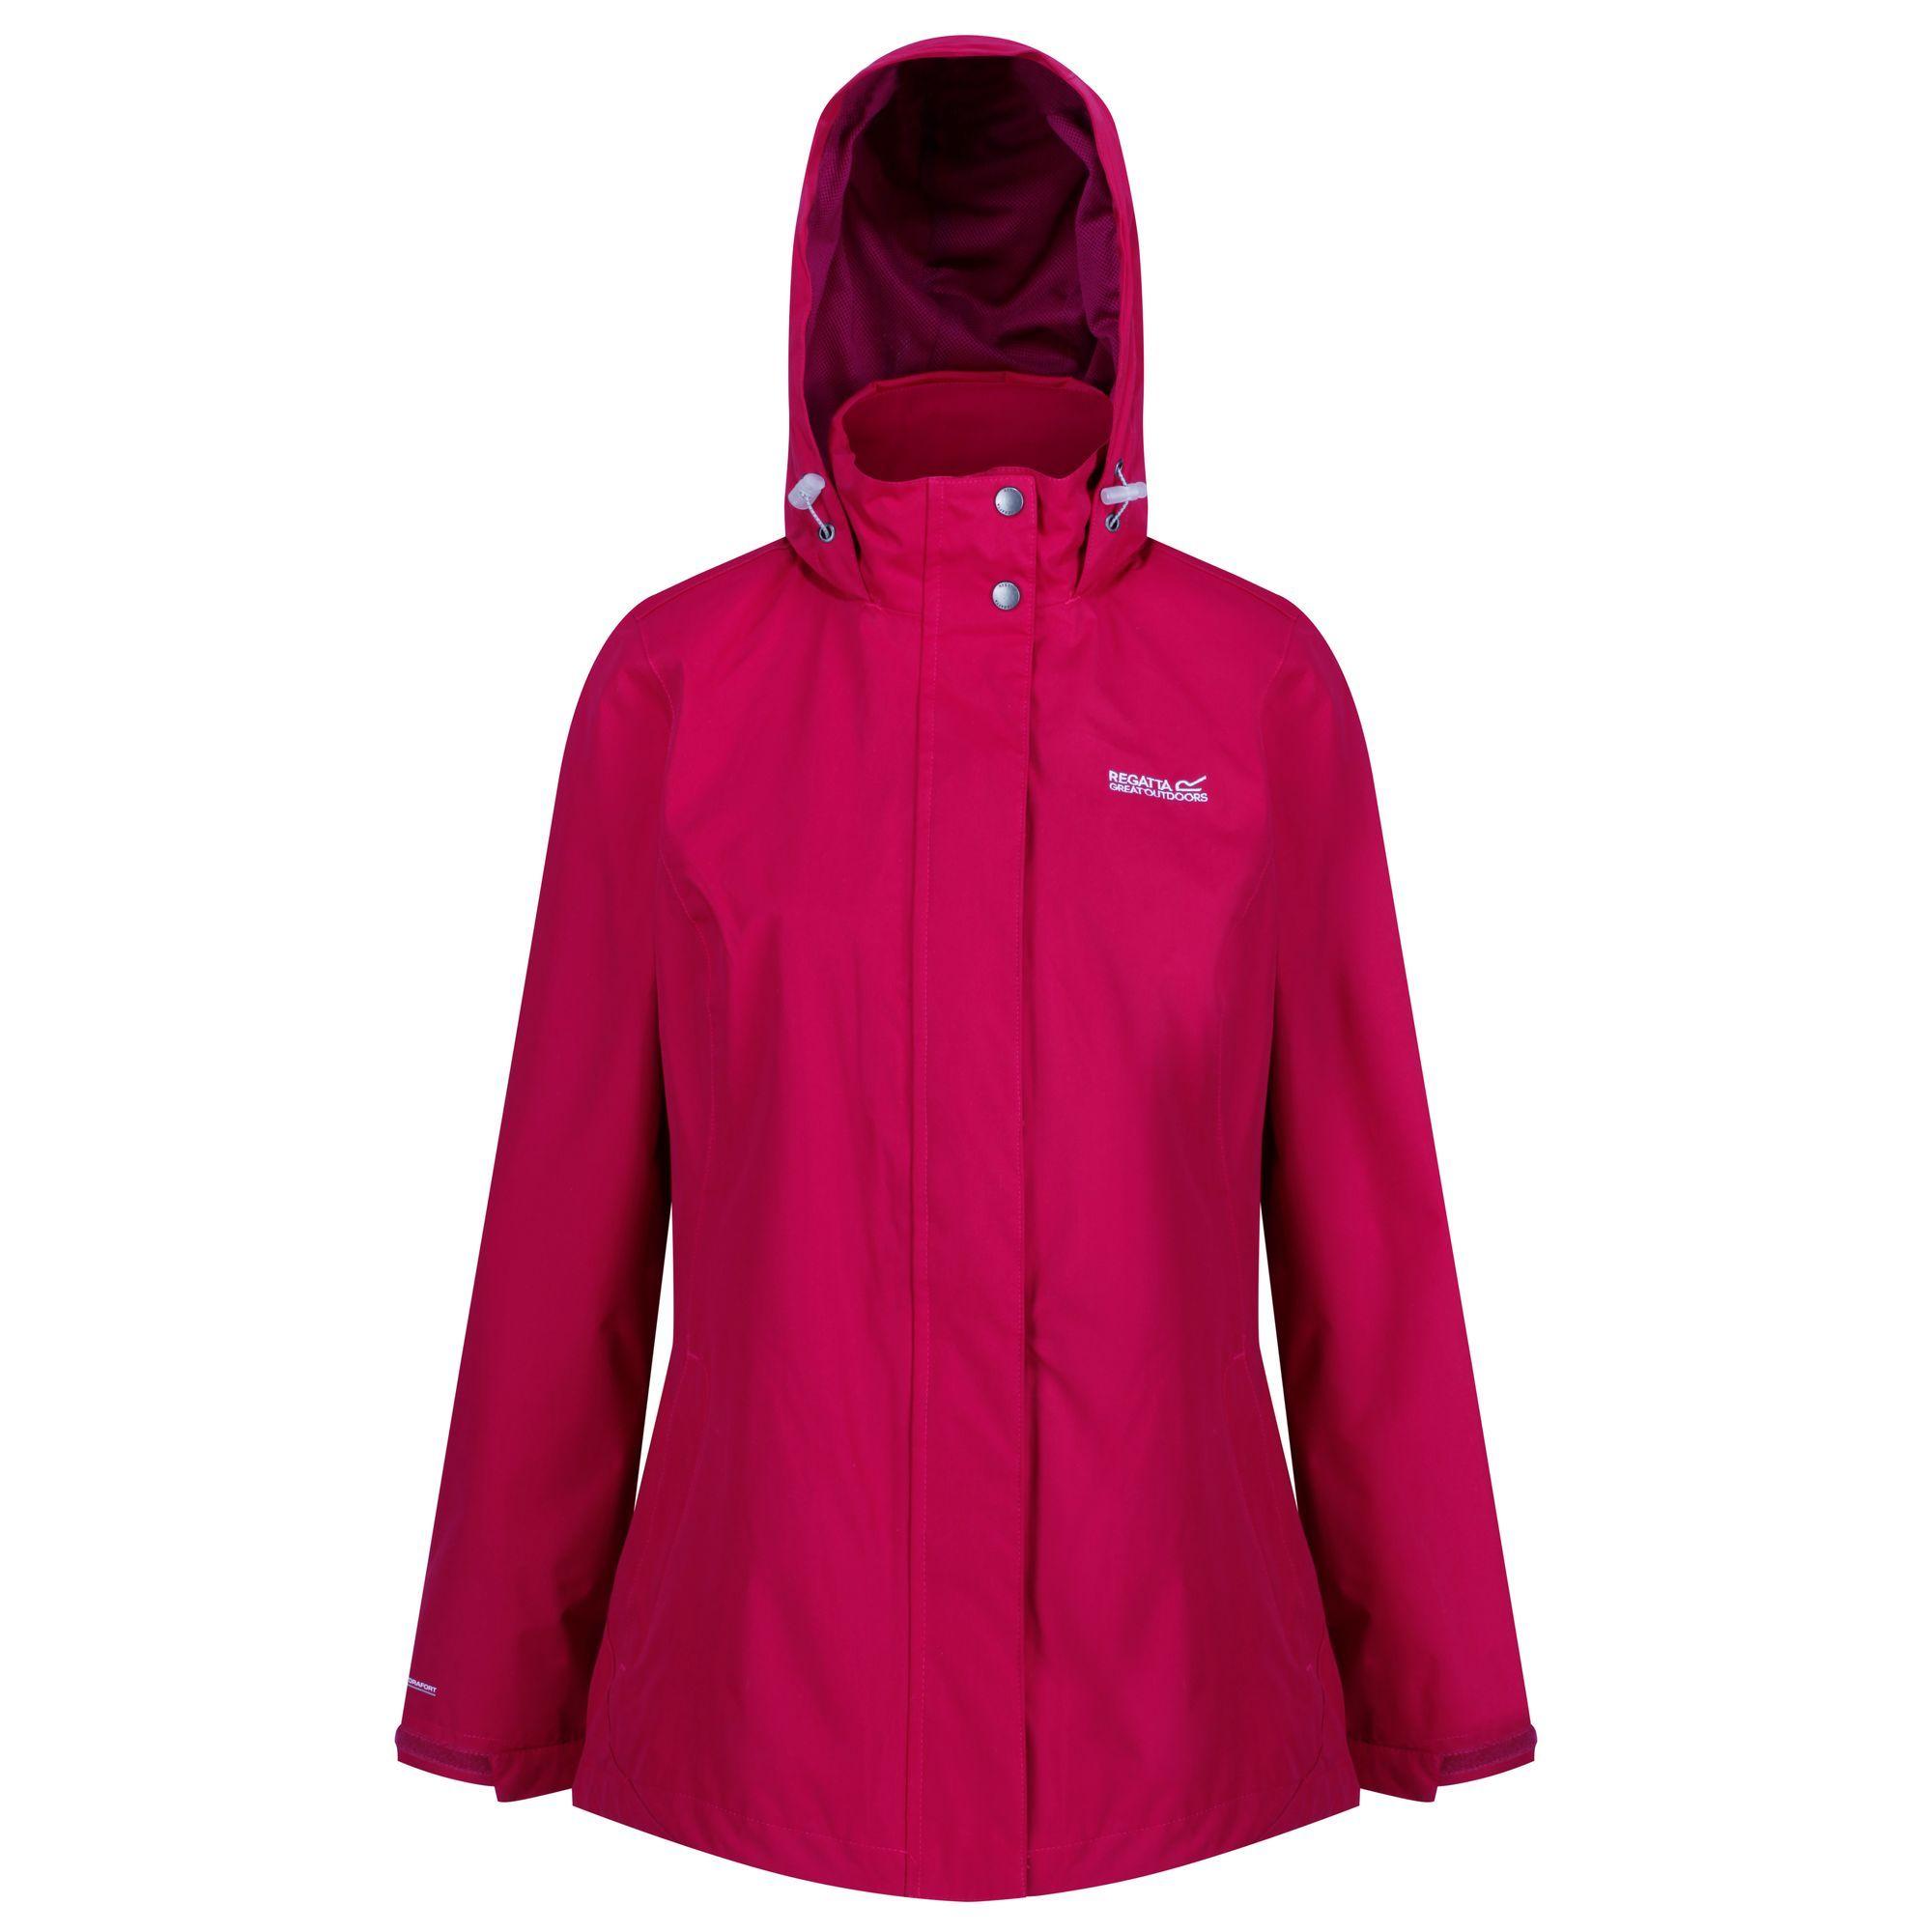 Regatta Great Outdoors Women's Daysha Waterproof Shell Jacket